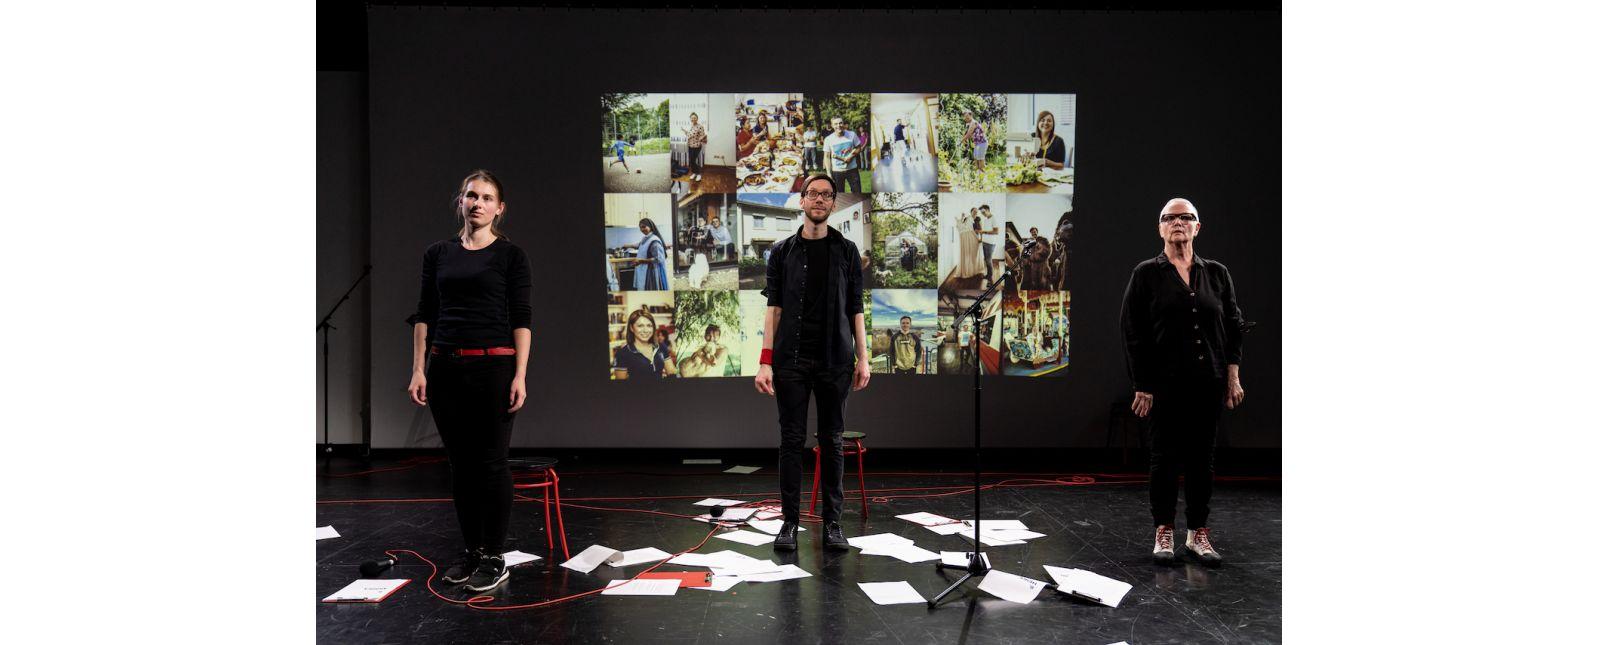 AUF KLINGEL // Hannah Ganter / Michael Kaiser / Margarethe Mehring-Fuchs // 2021 // Foto: Britt Schilling